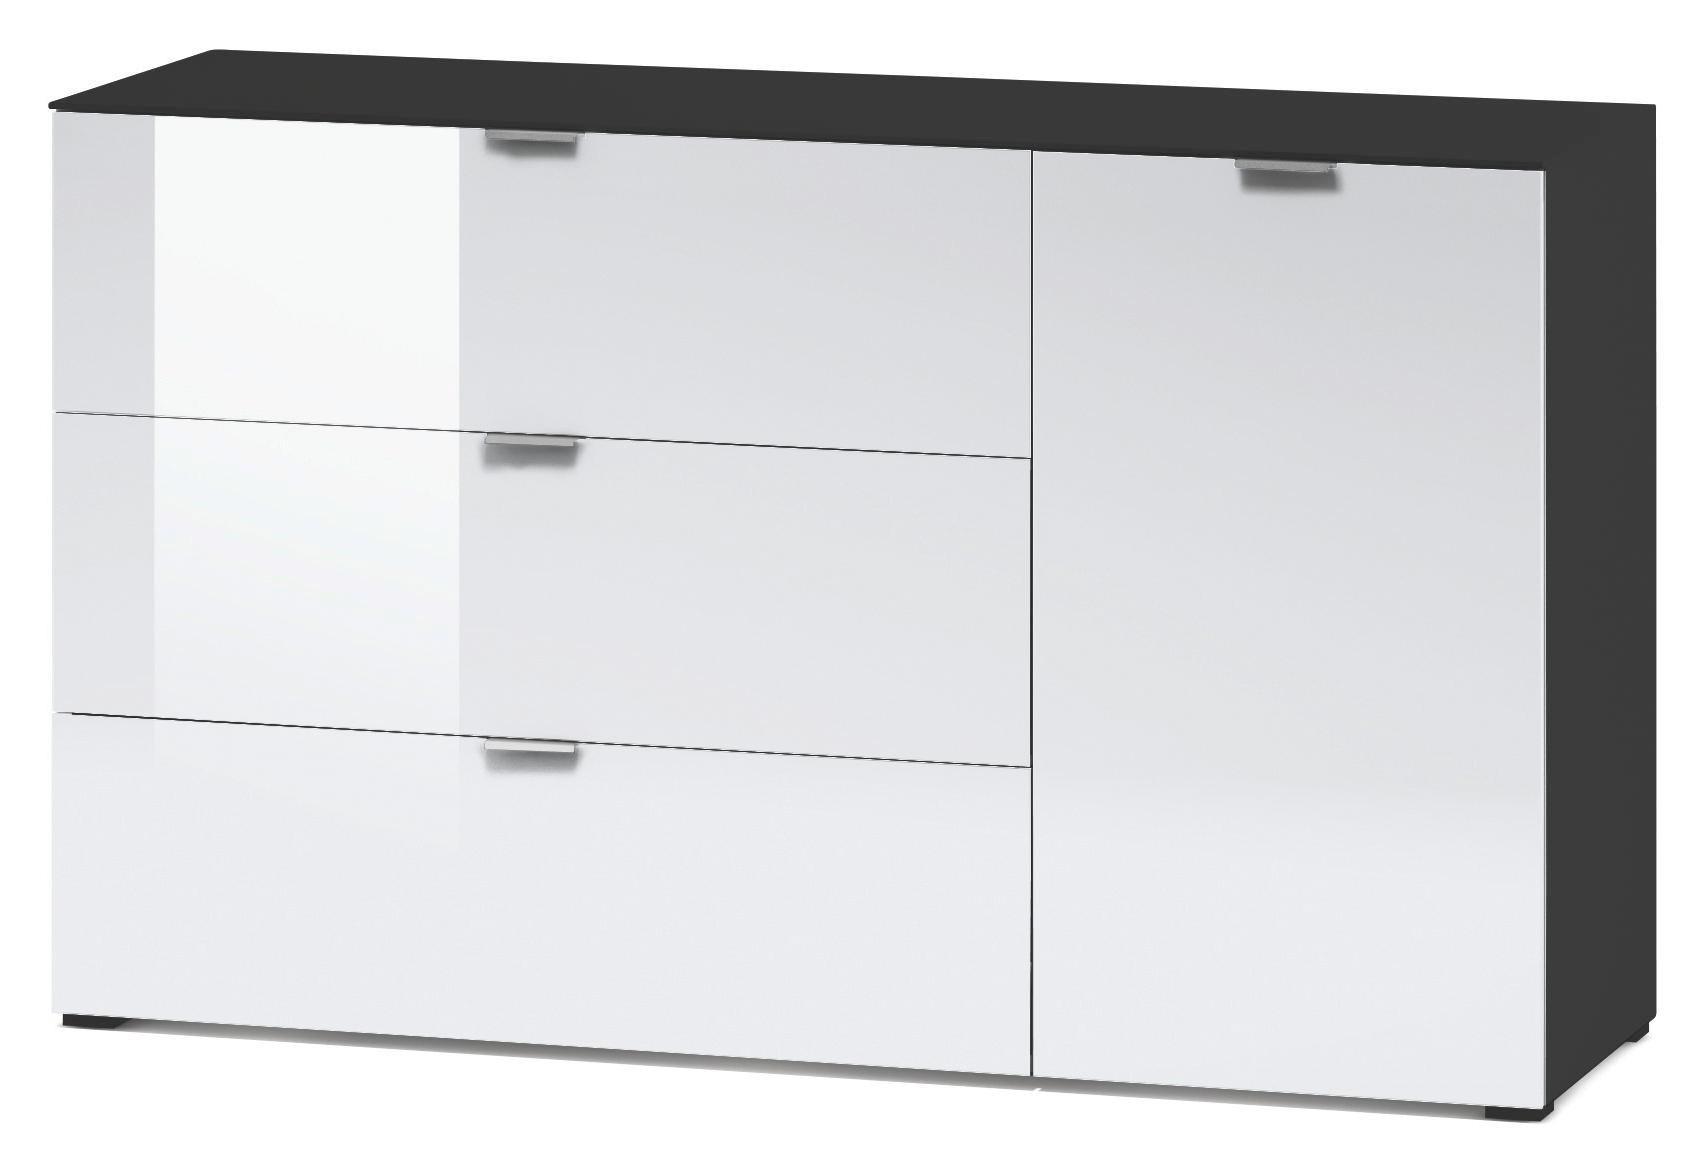 Kommode Glasfront Kommode Schubladenkommode Anrichte Easy Plus